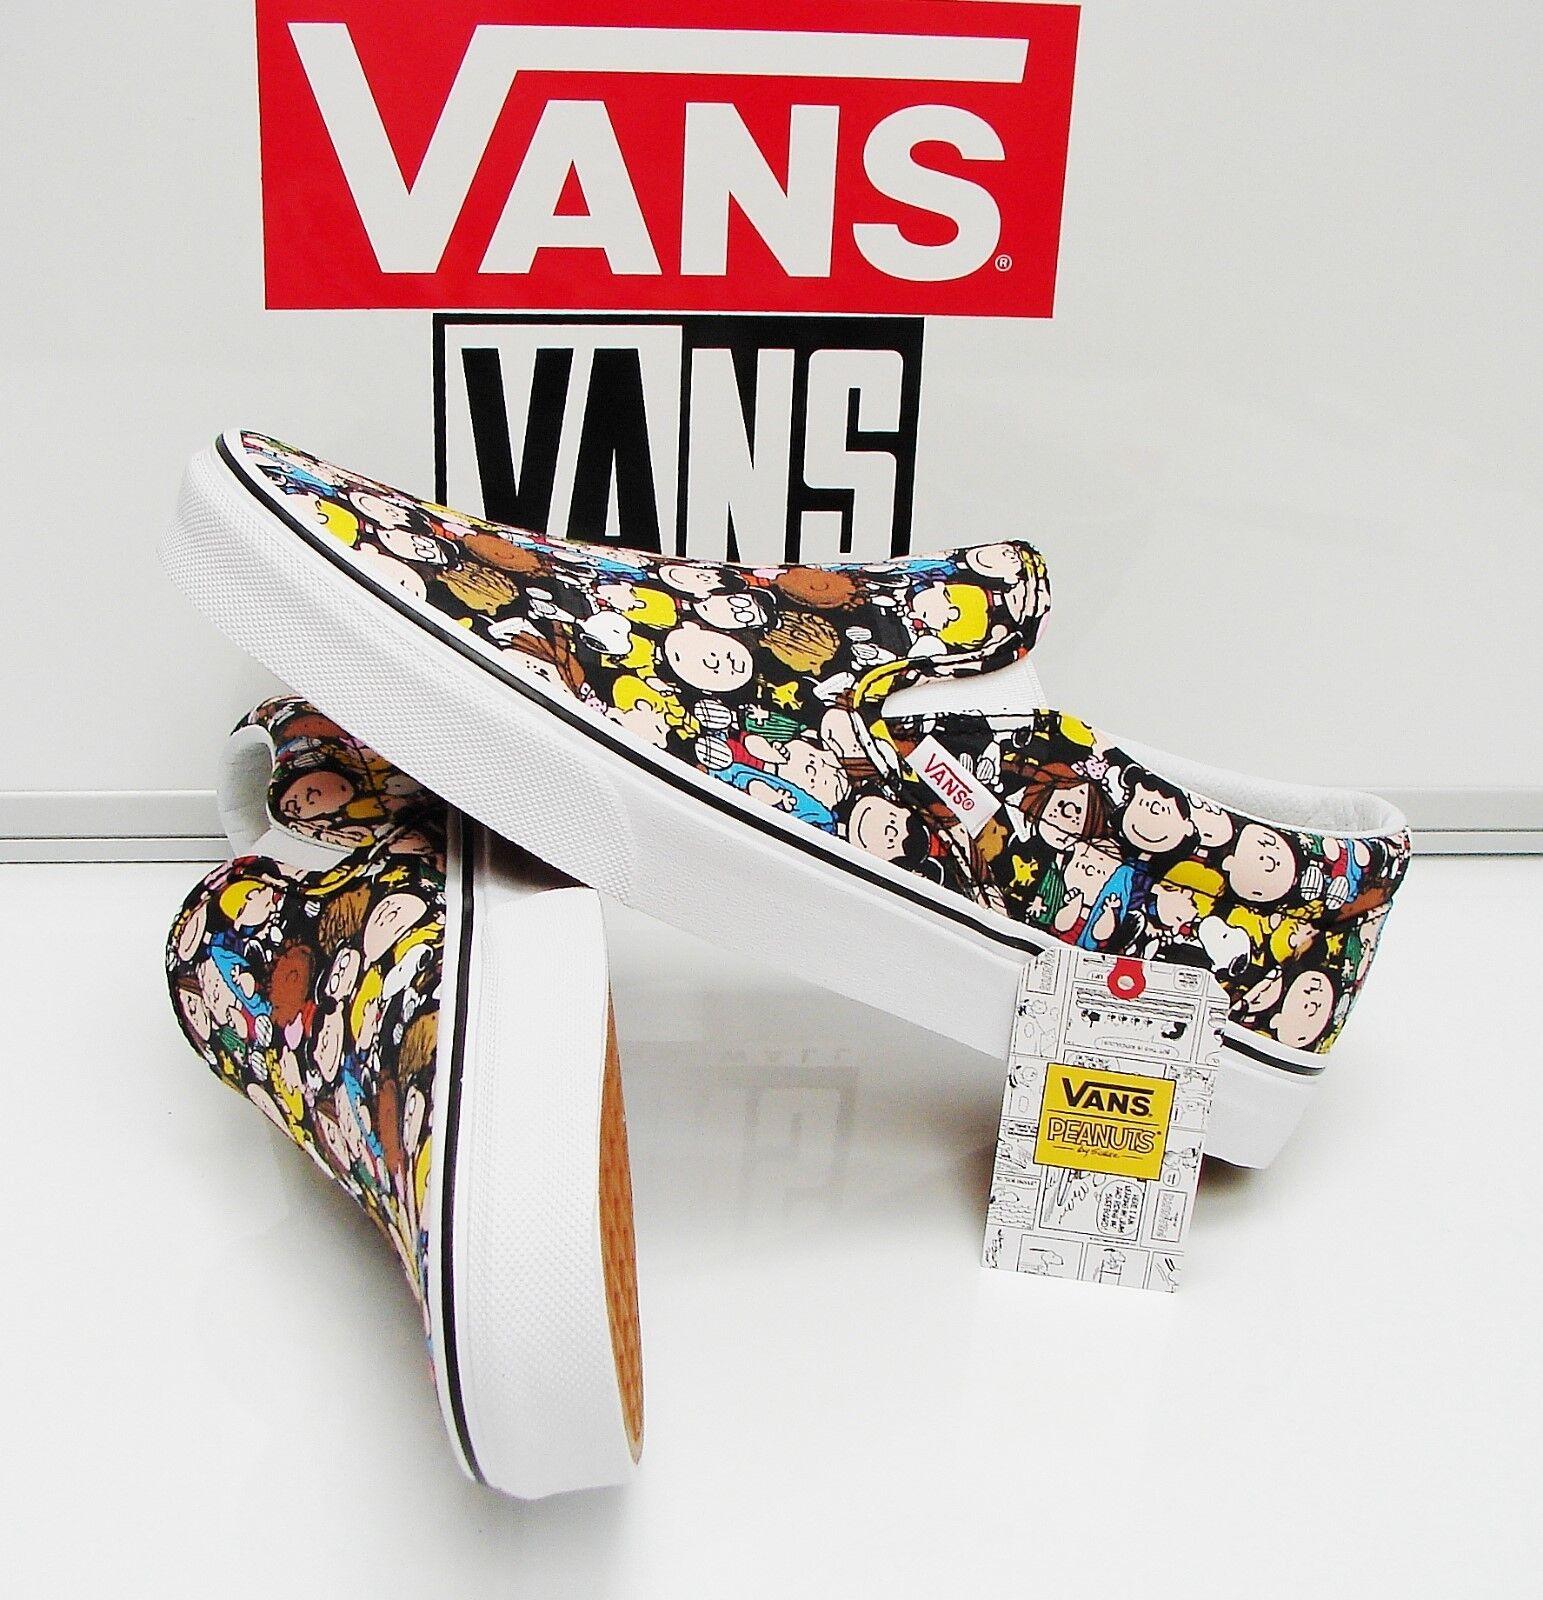 Vans Classic Slip On Peanuts The Gang Black VN0A38F7OQX Men's Size: 9.5